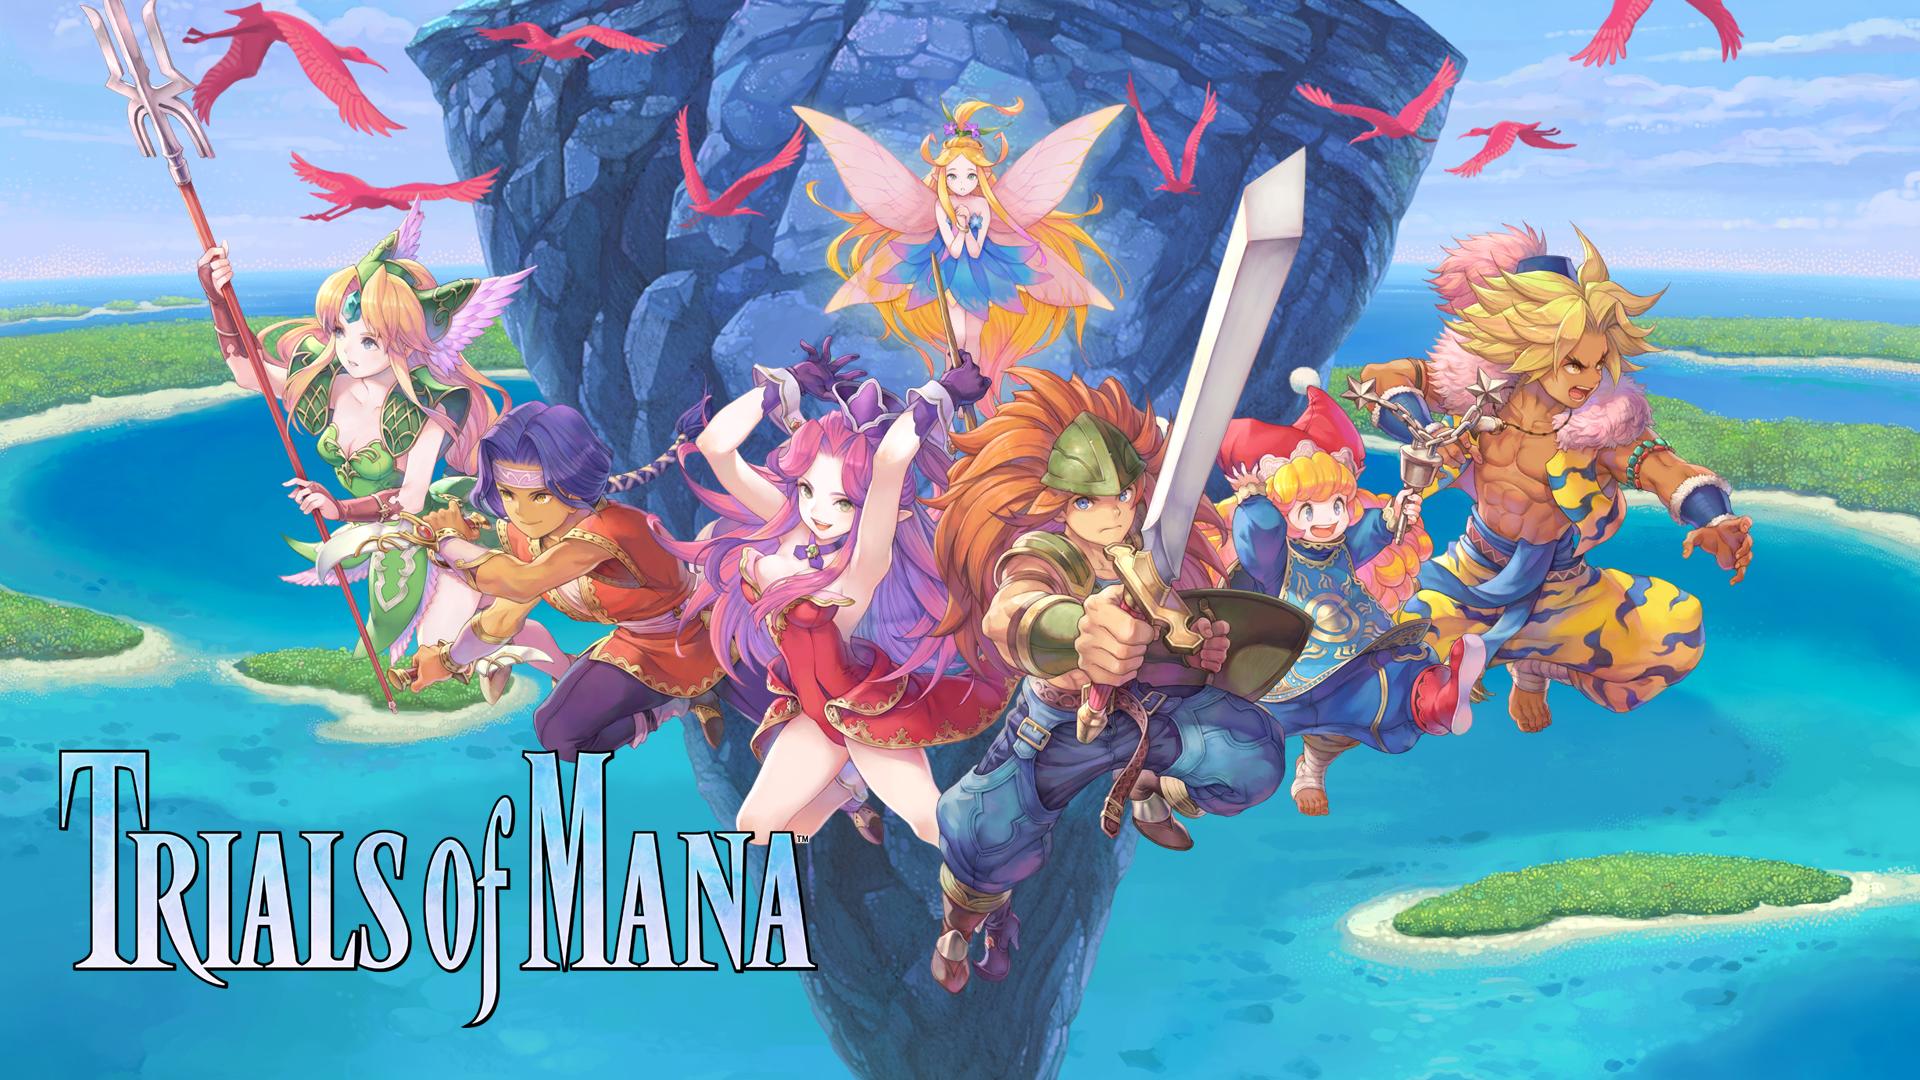 Square Enix Trials of Mana Keyart